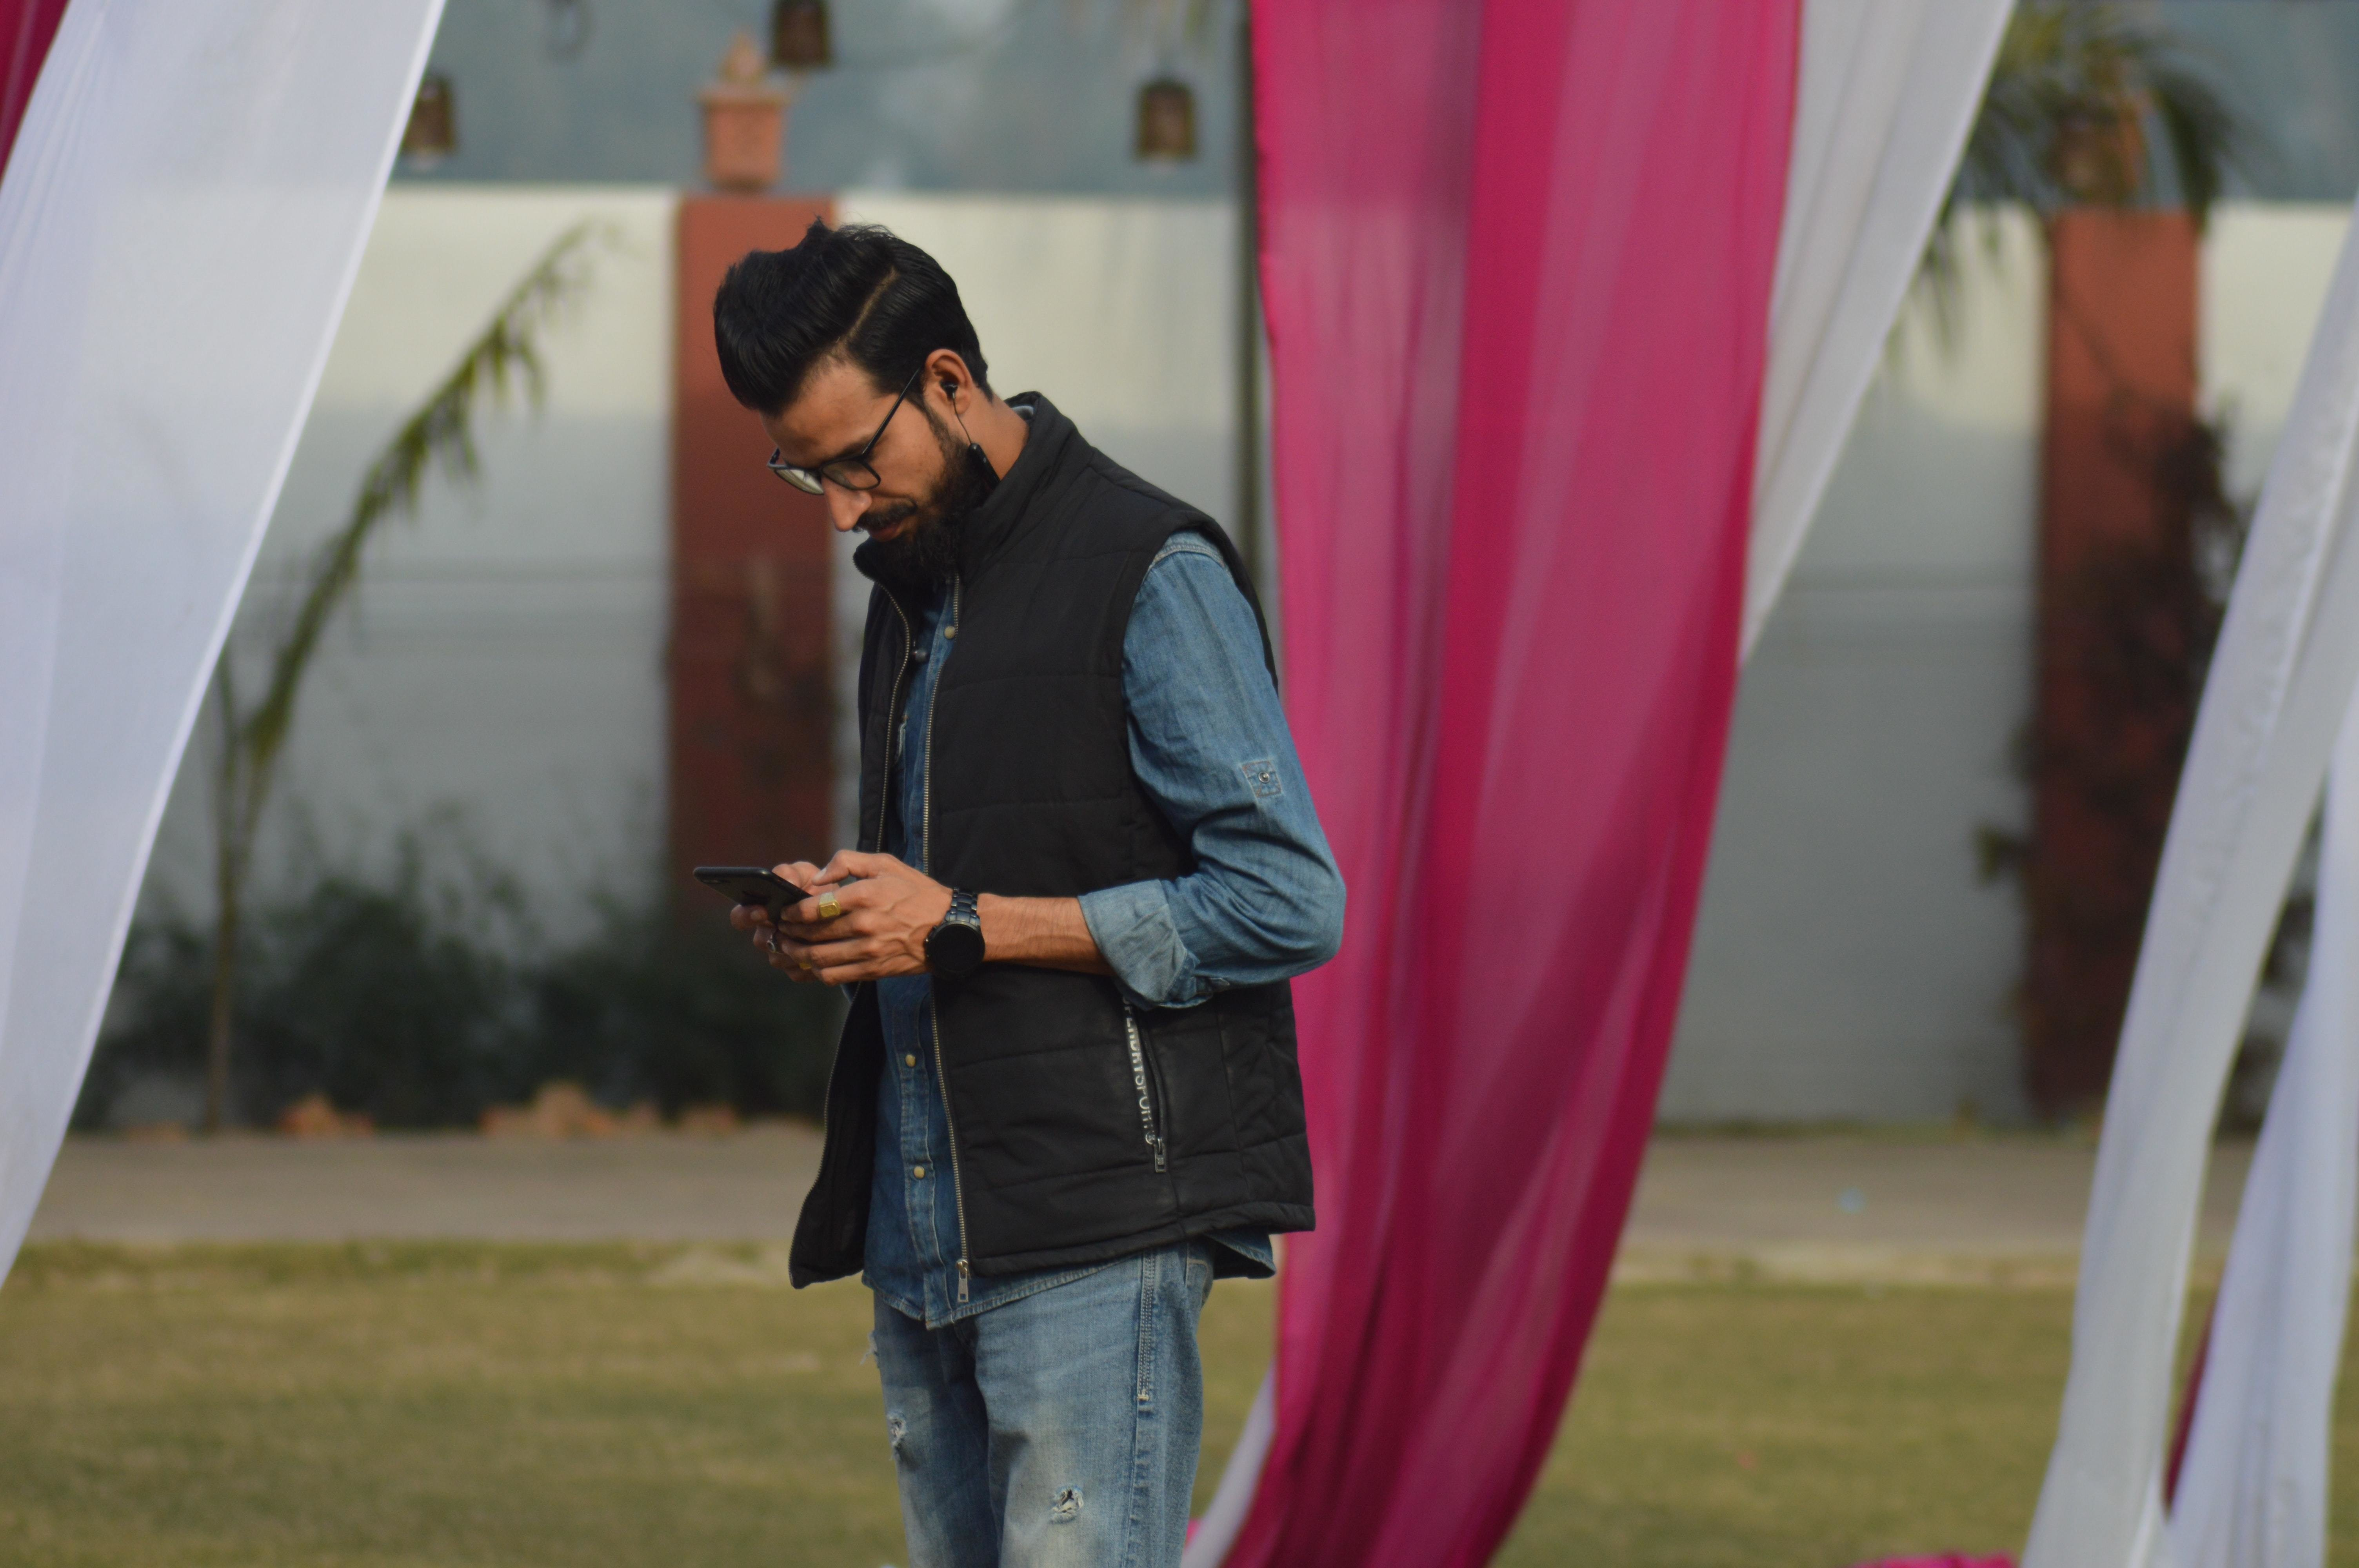 A man in Bijnor, Uttar Pradesh, India, viewing his mobile phone.